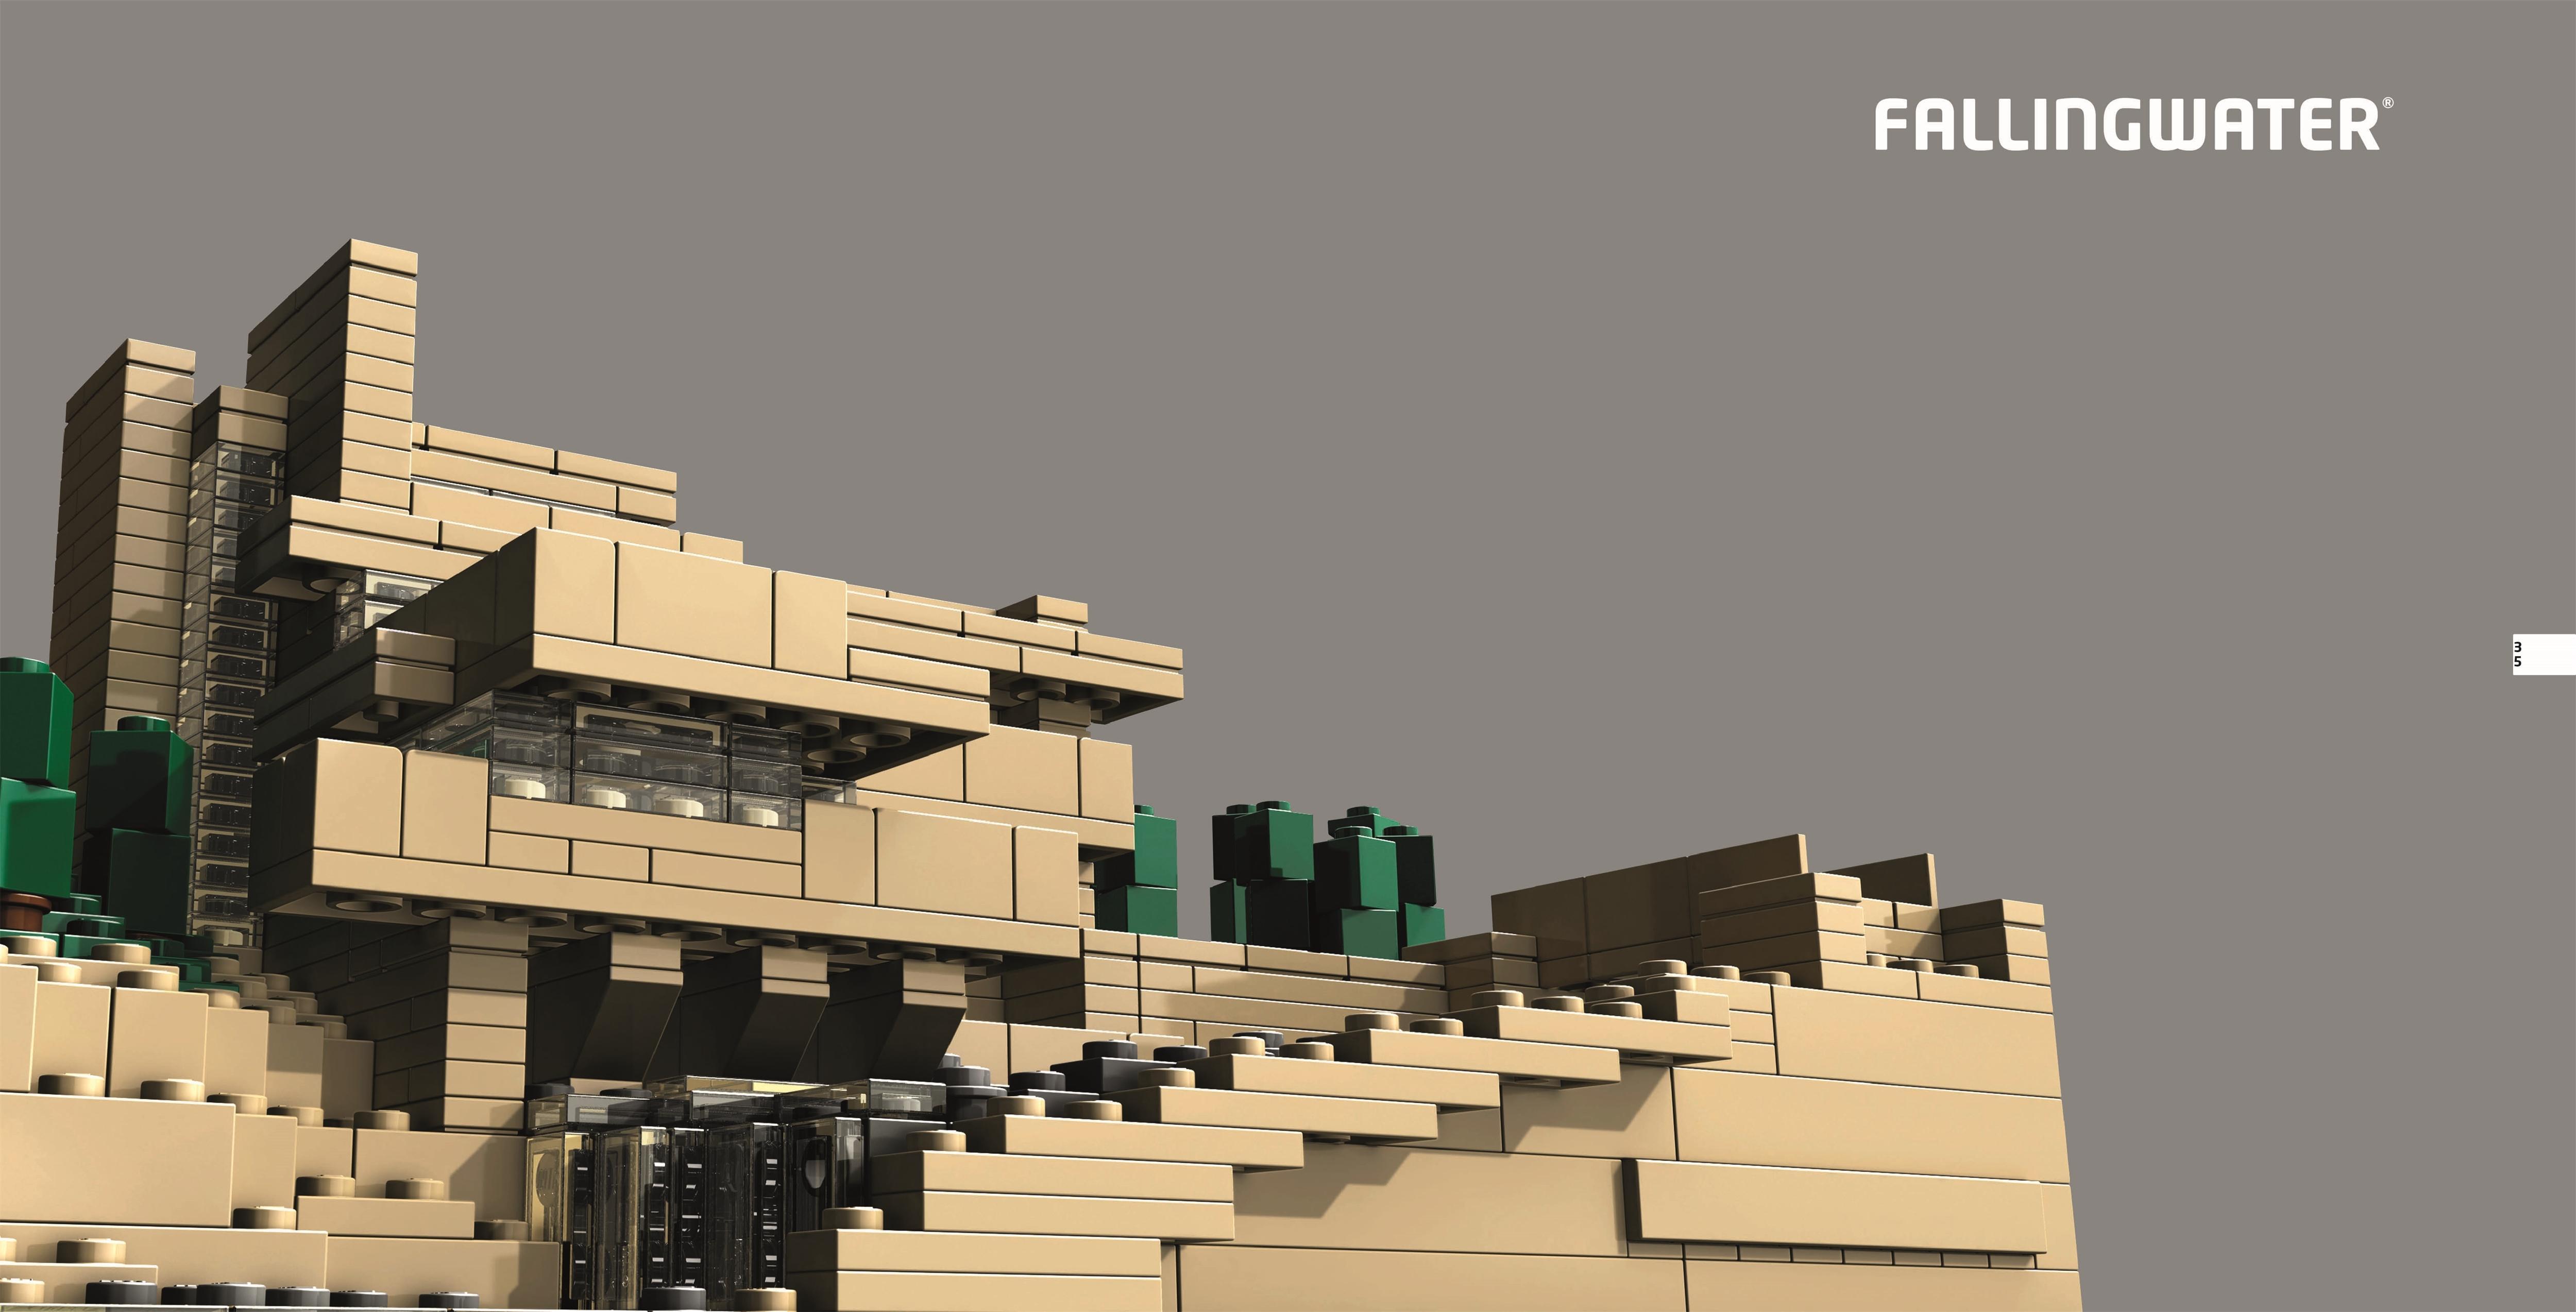 lego architecture fallingwater instructions